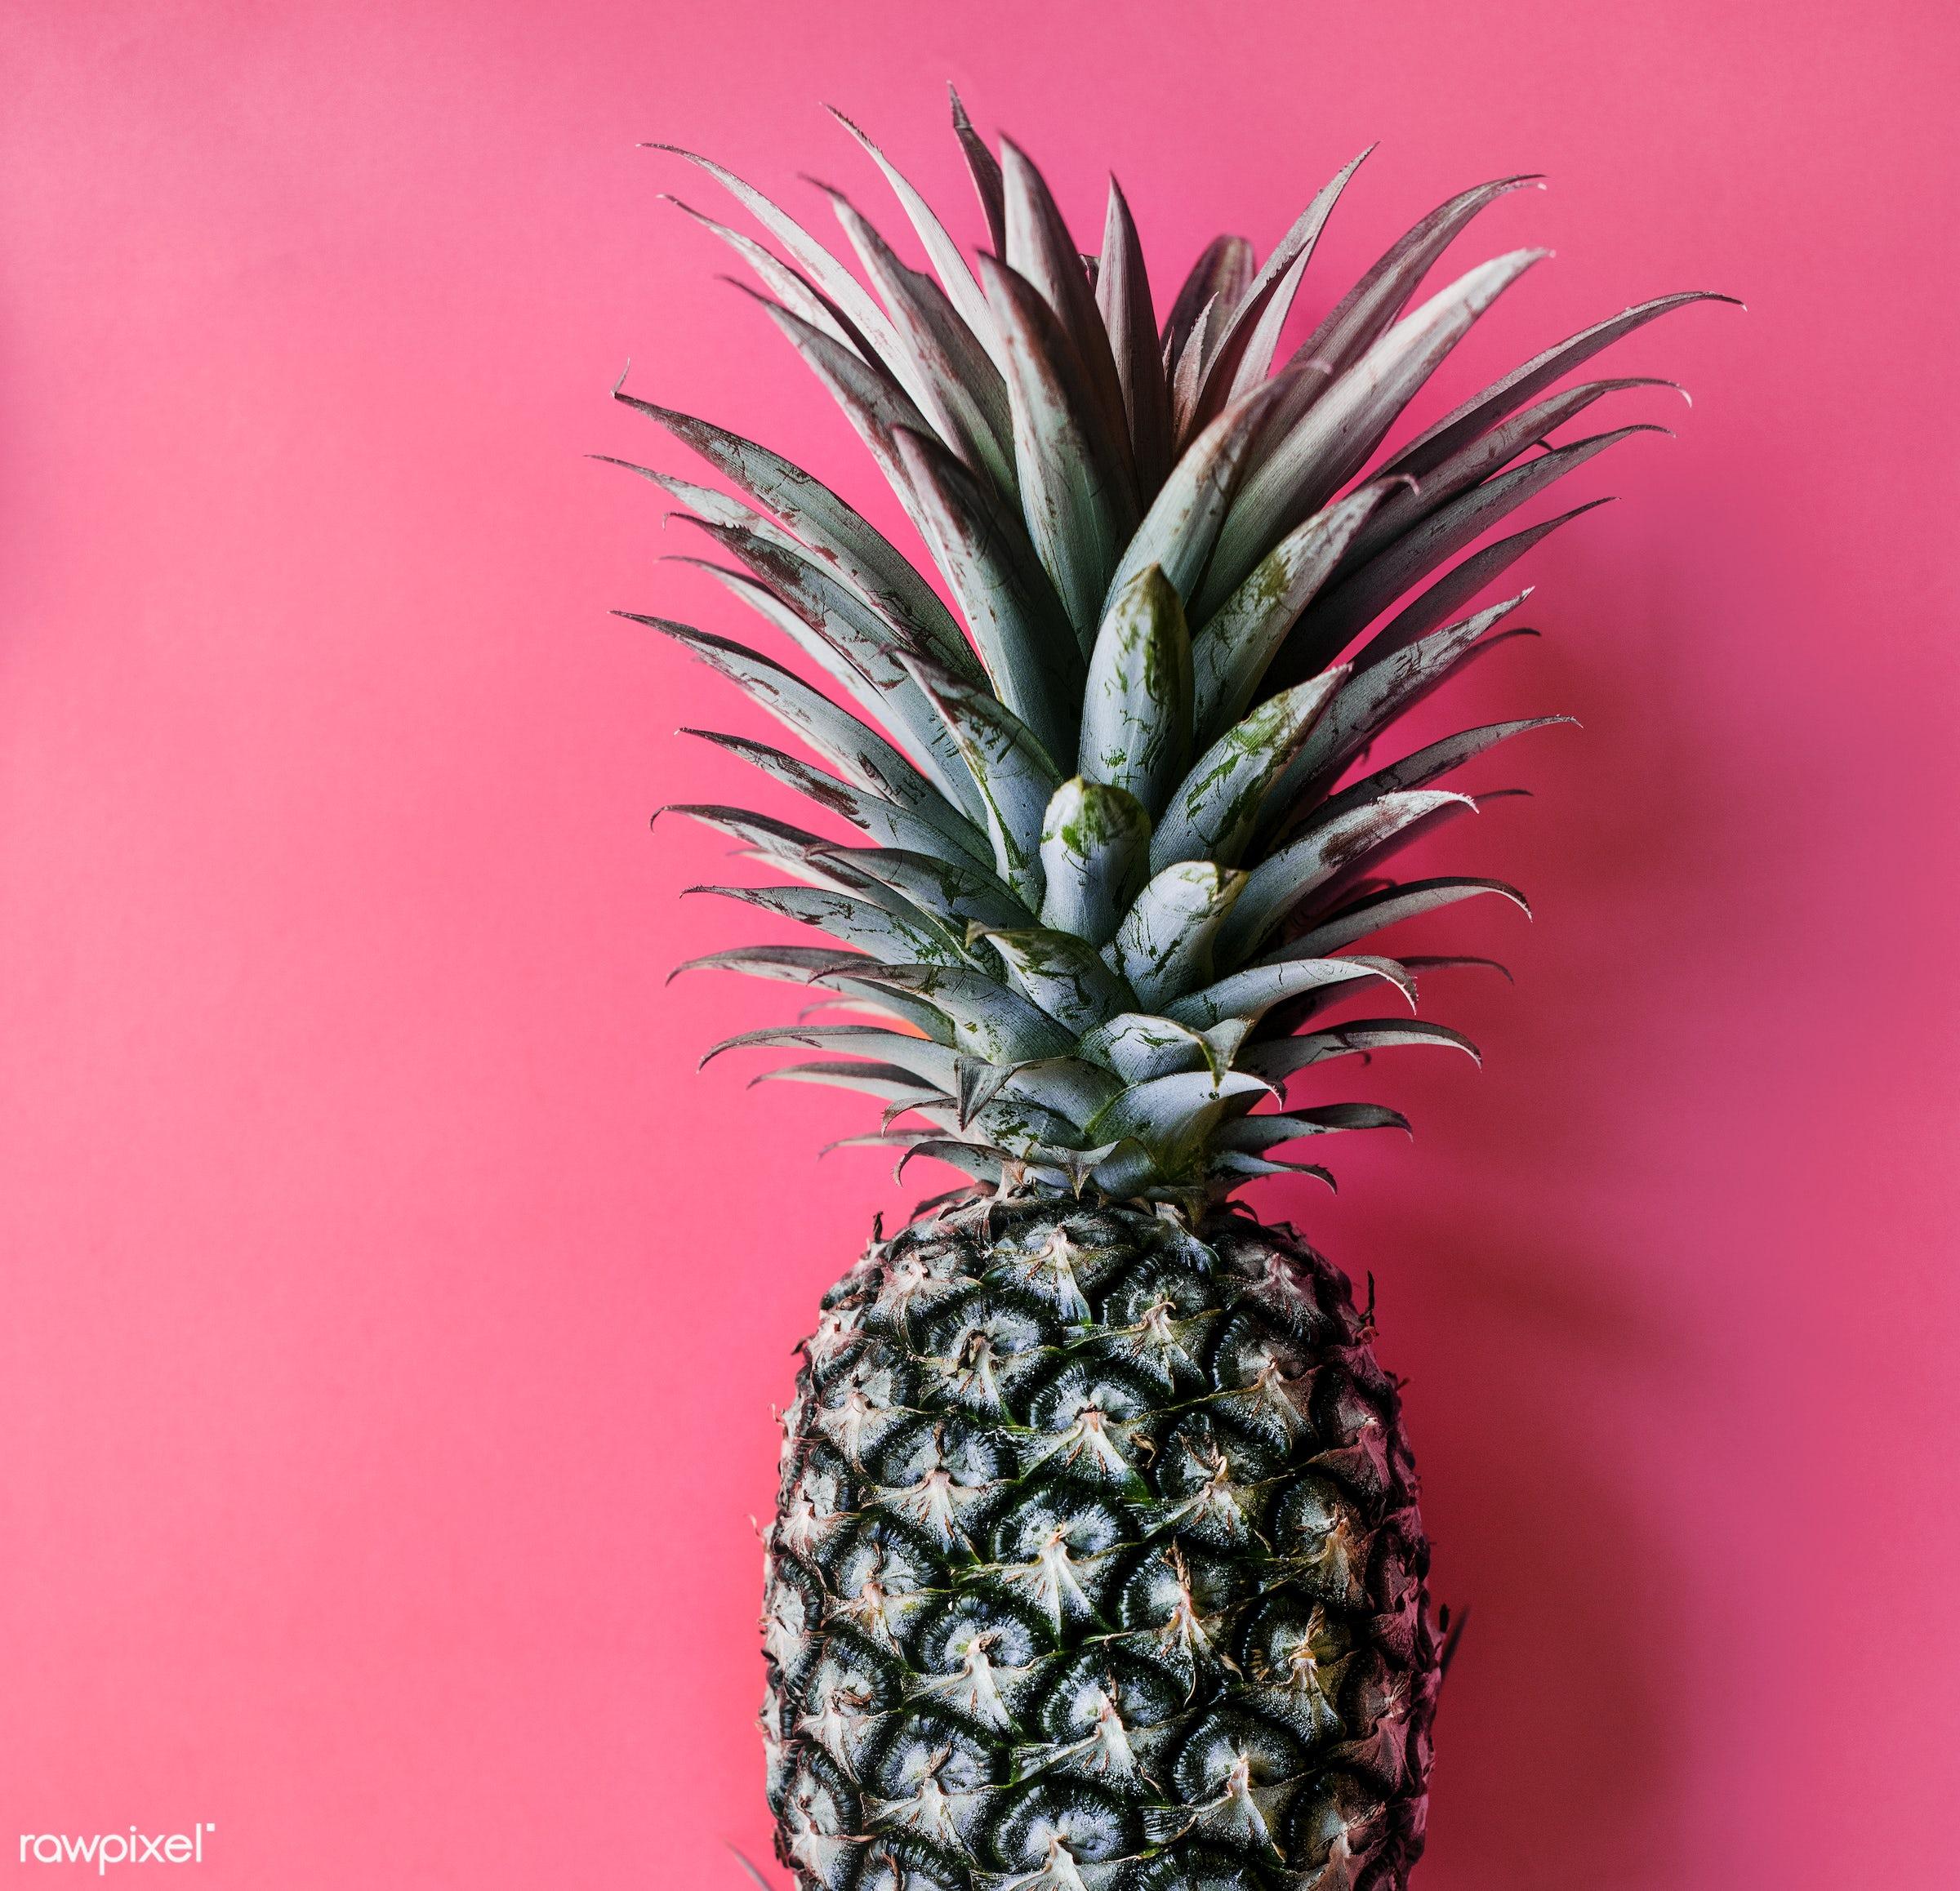 juicy, tropical, hawaiian, vitamins, fresh, antioxidant, isolated, fruit, fruits, refreshment, health, edible, tasty,...